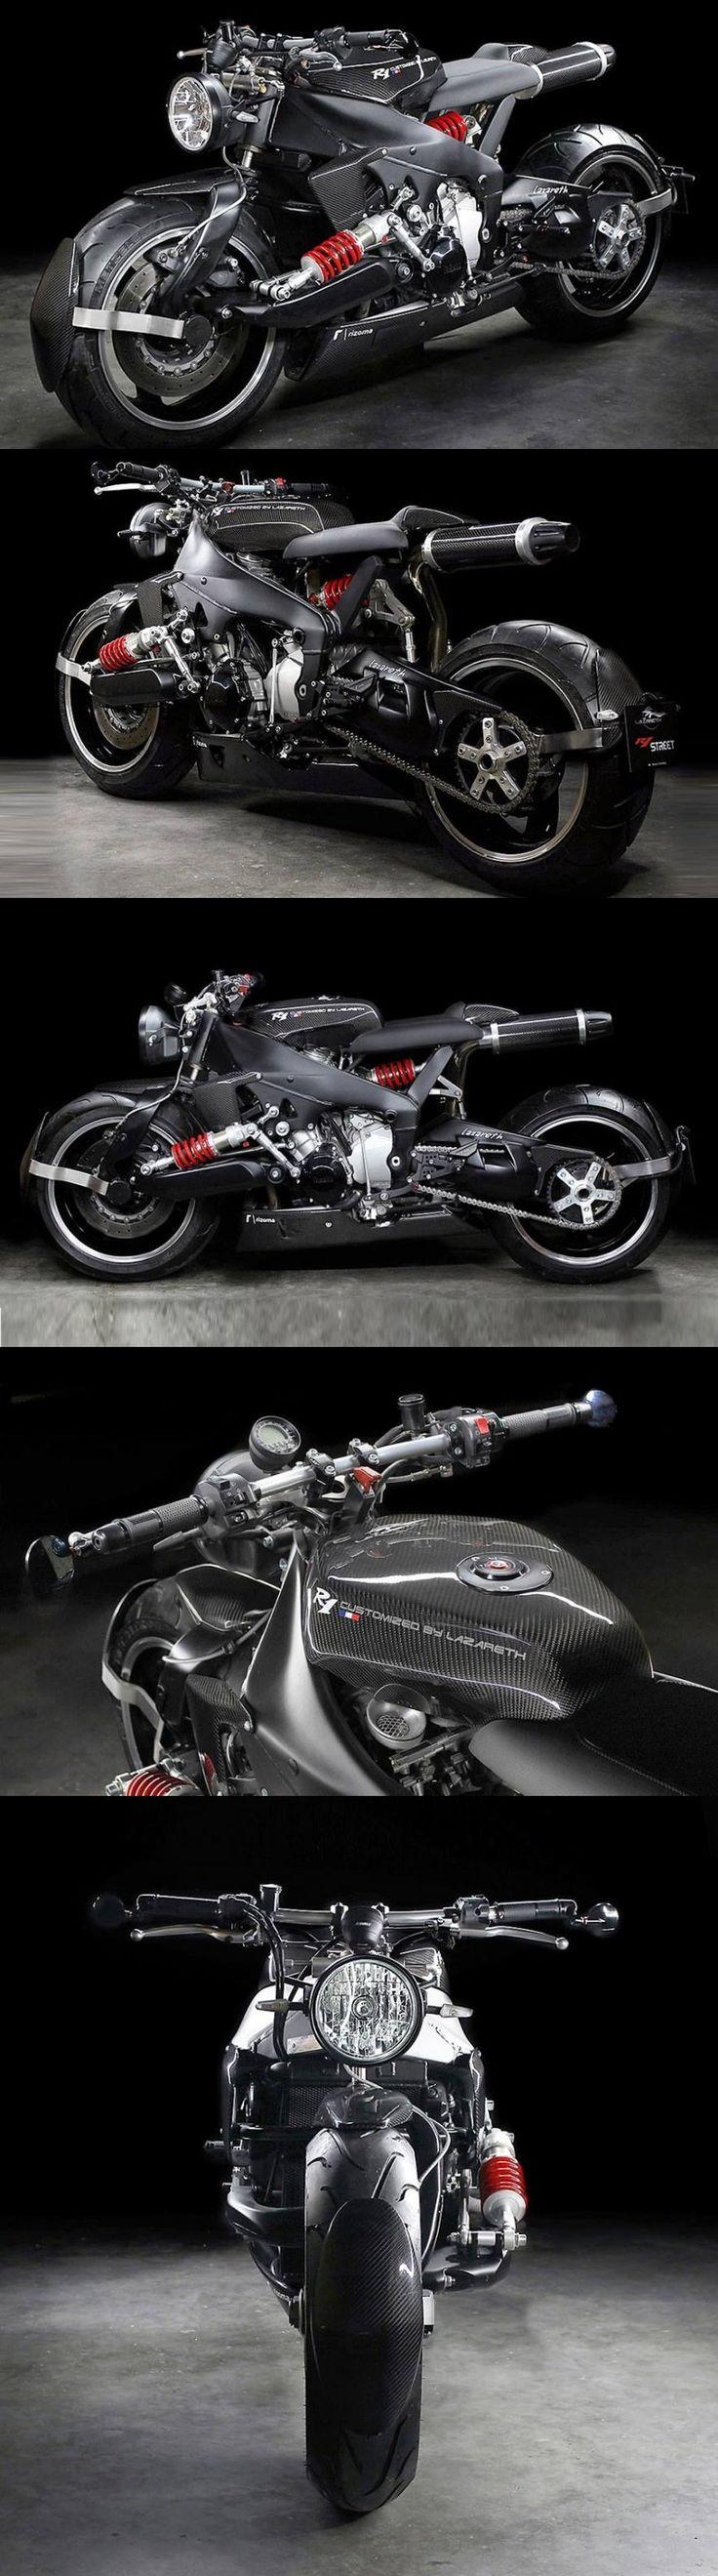 Yamaha YZF R1 Street by Ludovic Lazareth